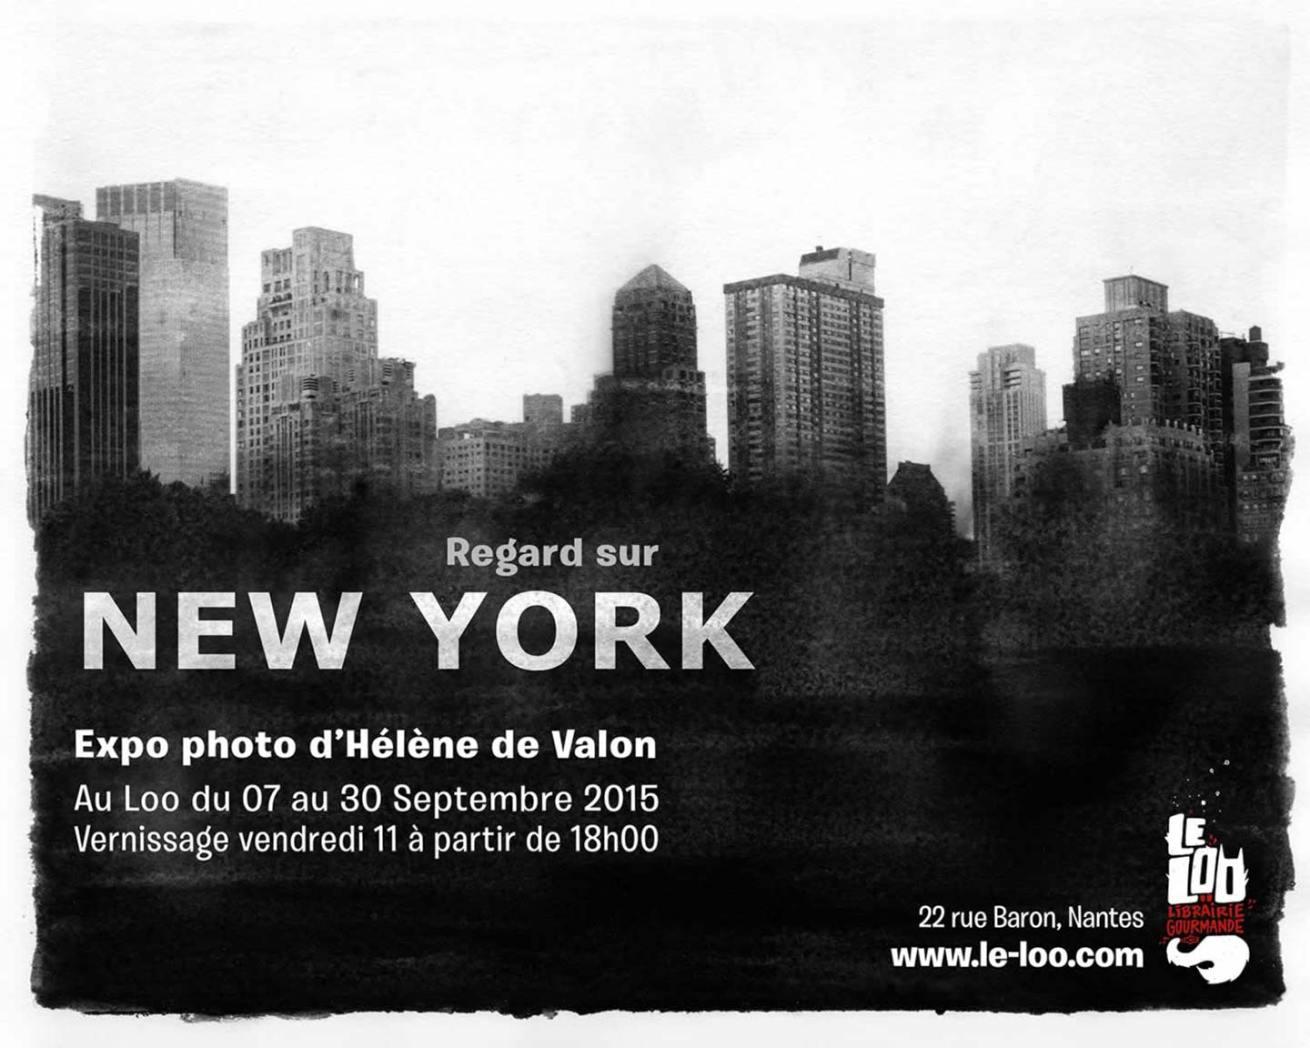 Helene de Valon exhibition, Regard sur New York